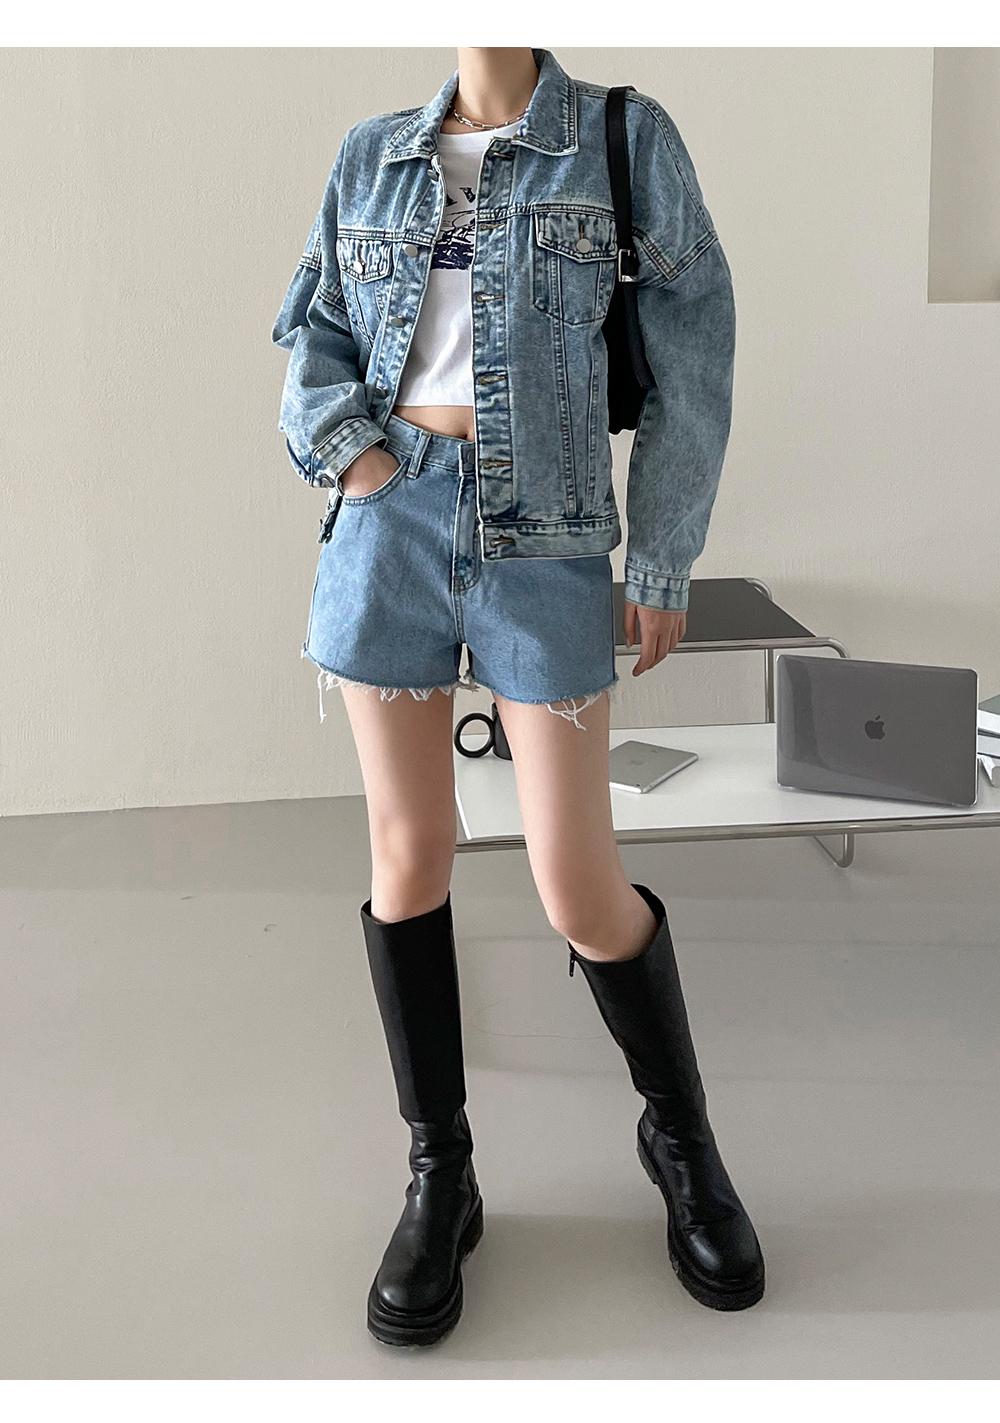 Decure overfit denim jacket